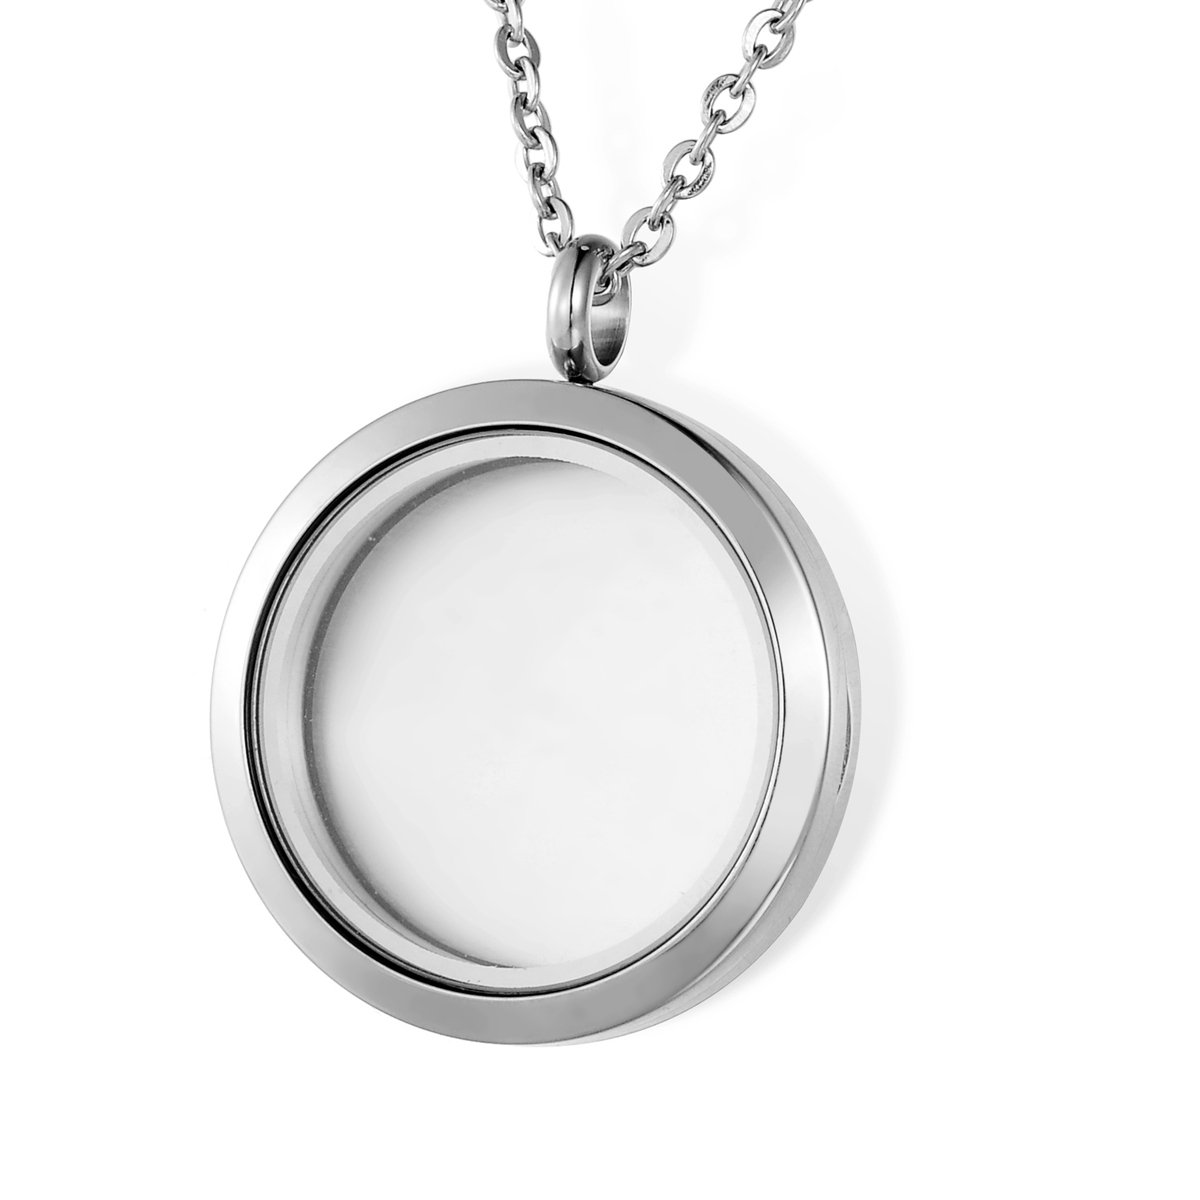 HOUSWEETY Round Magnetic Closure Floating Living Memory Lockets Pendant Necklace HOUSWEETYB107942